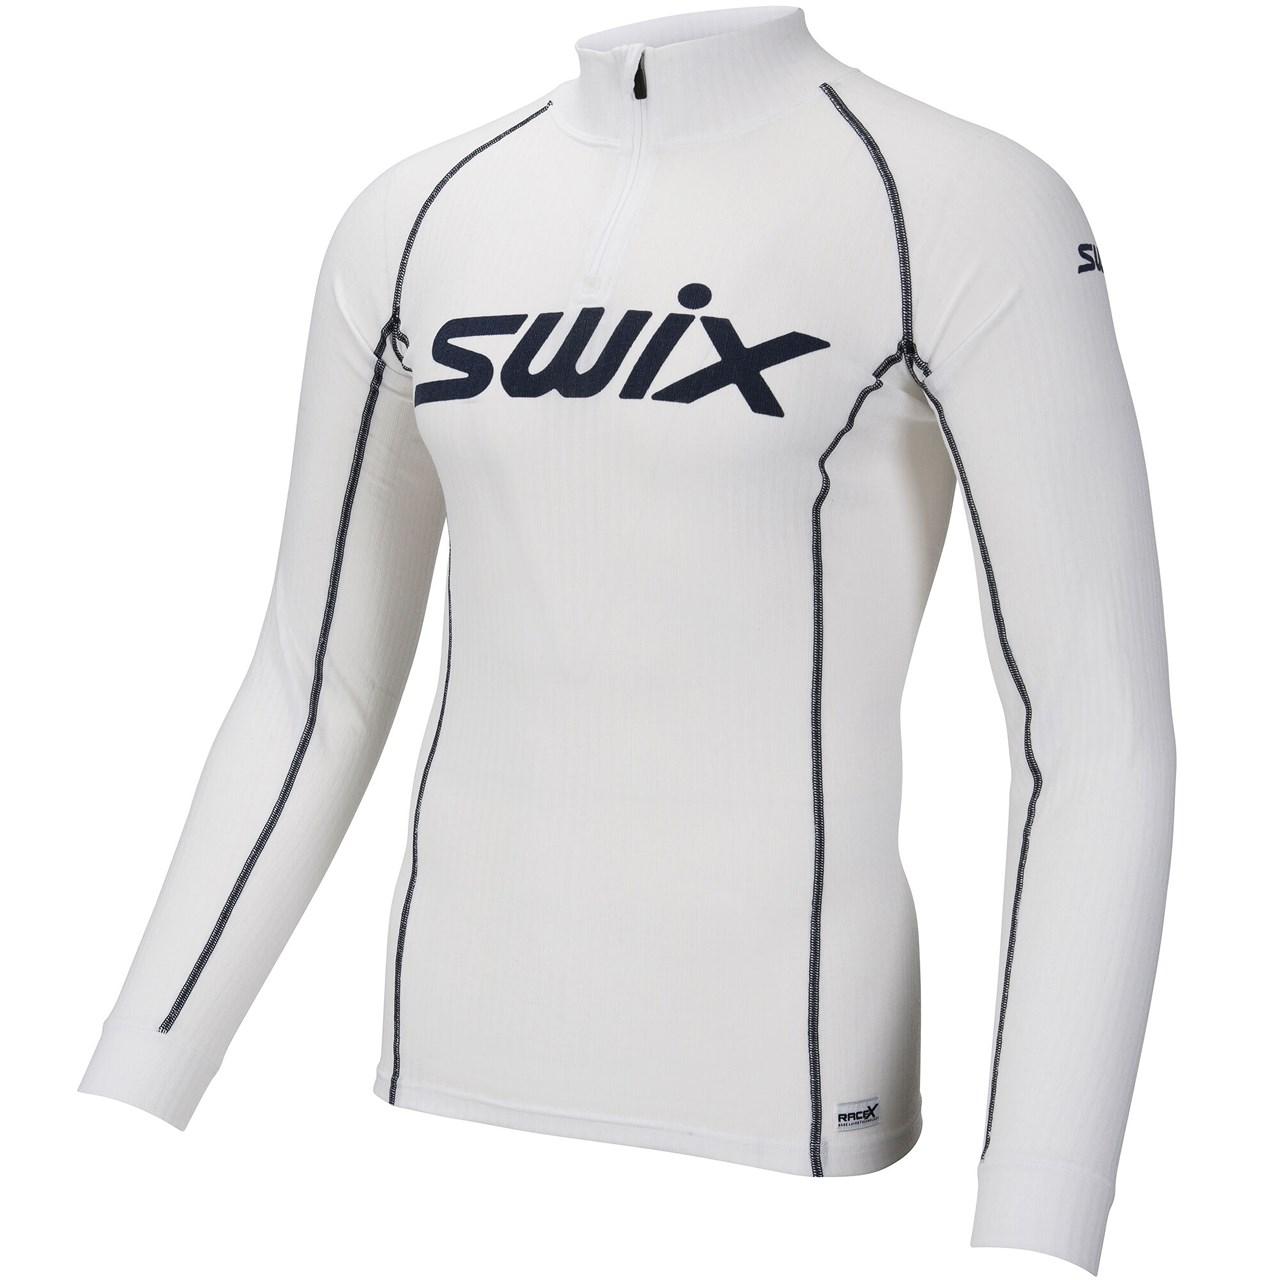 Swix RaceX Halfzip M